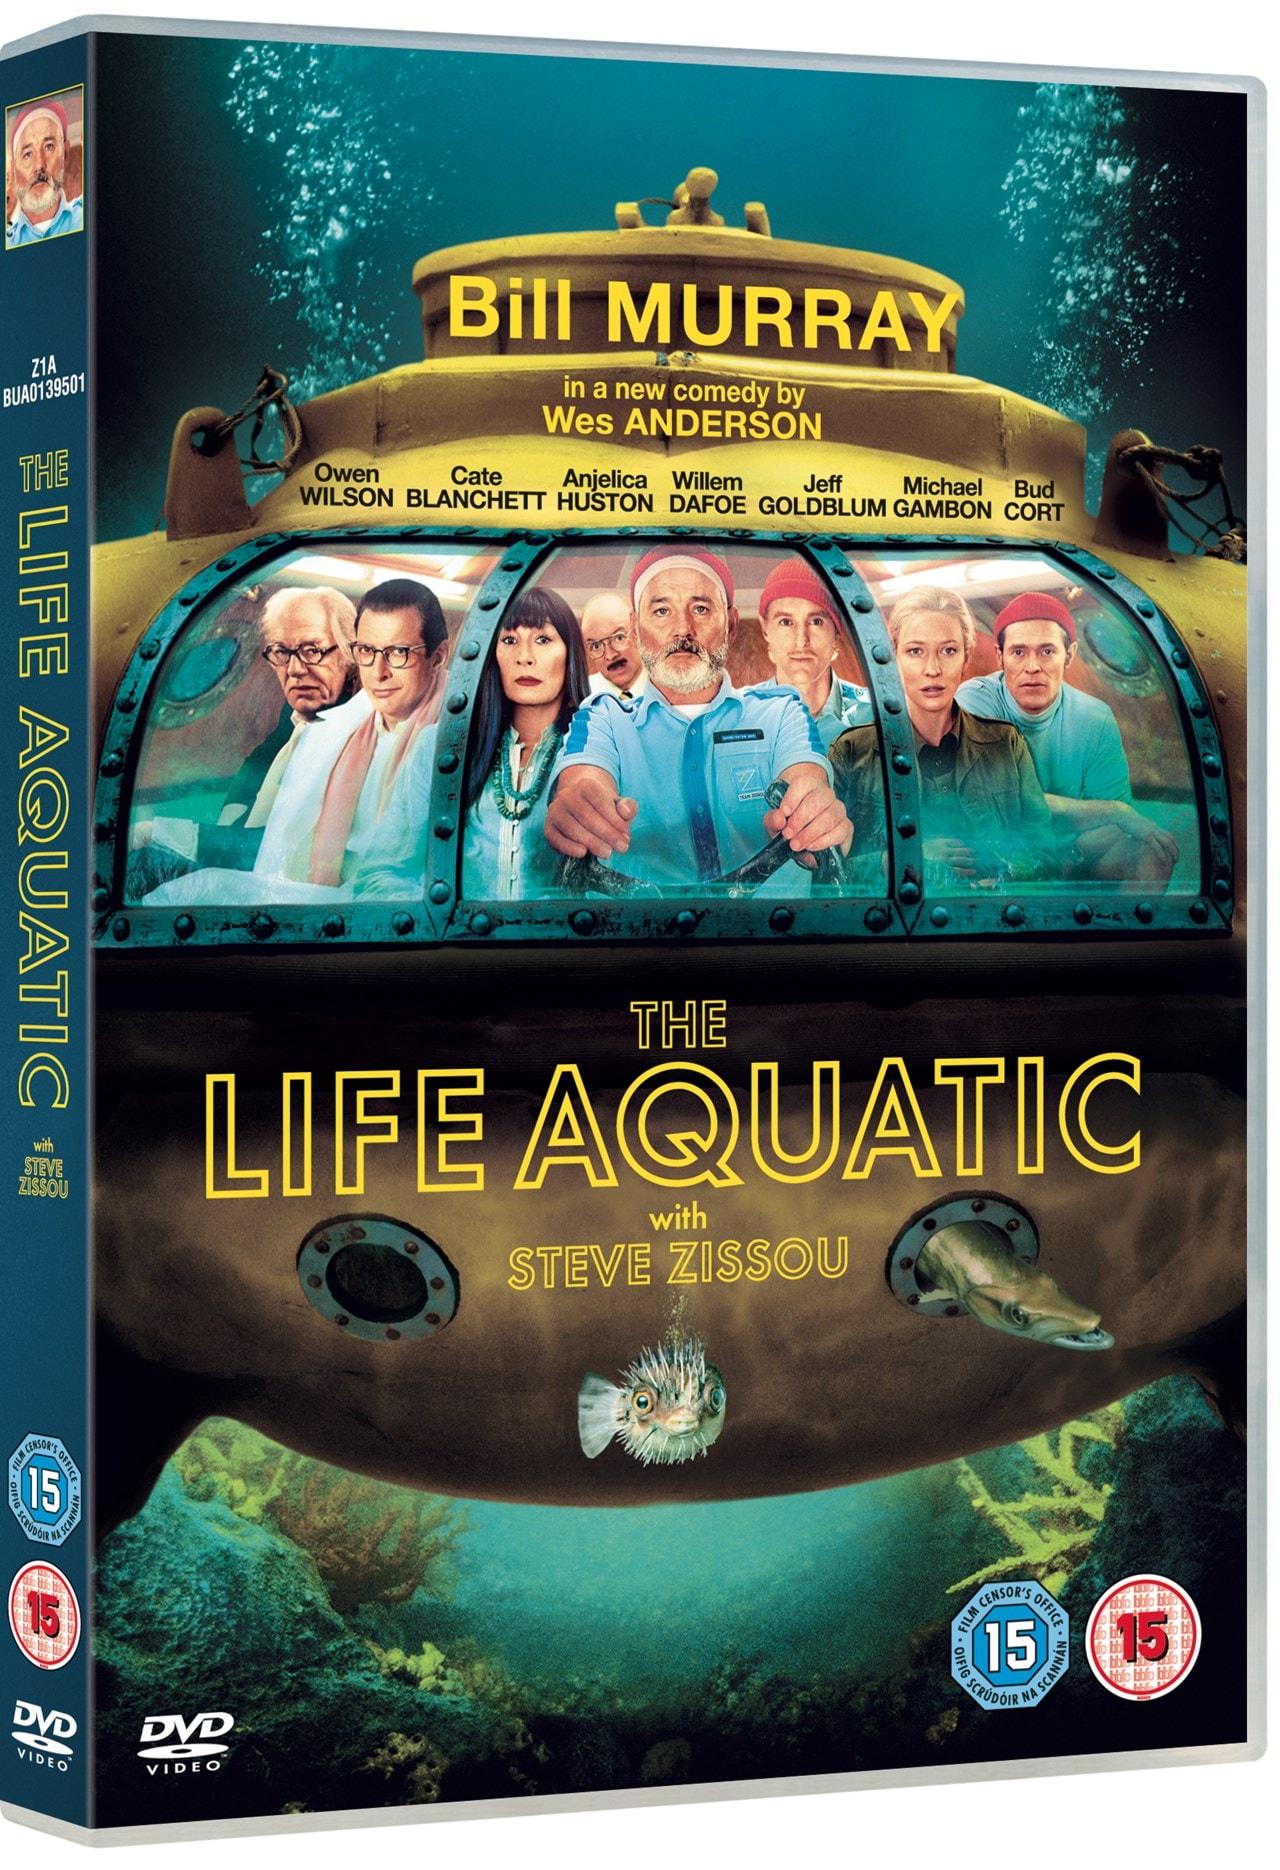 The Life Aquatic With Steve Zissou - 2